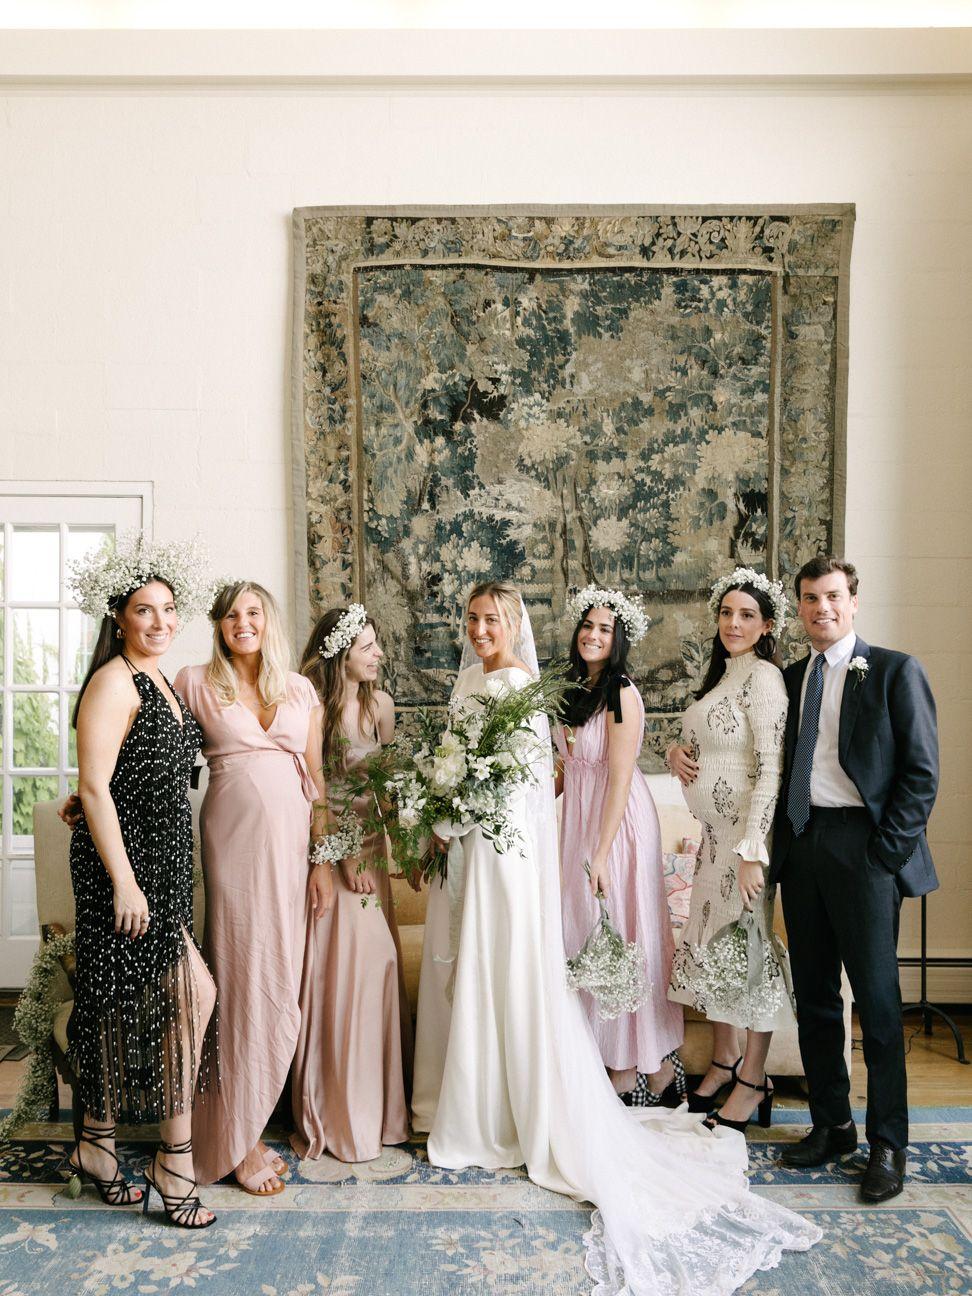 KareHillPhotography-Nassikas-Wedding-0408.jpg